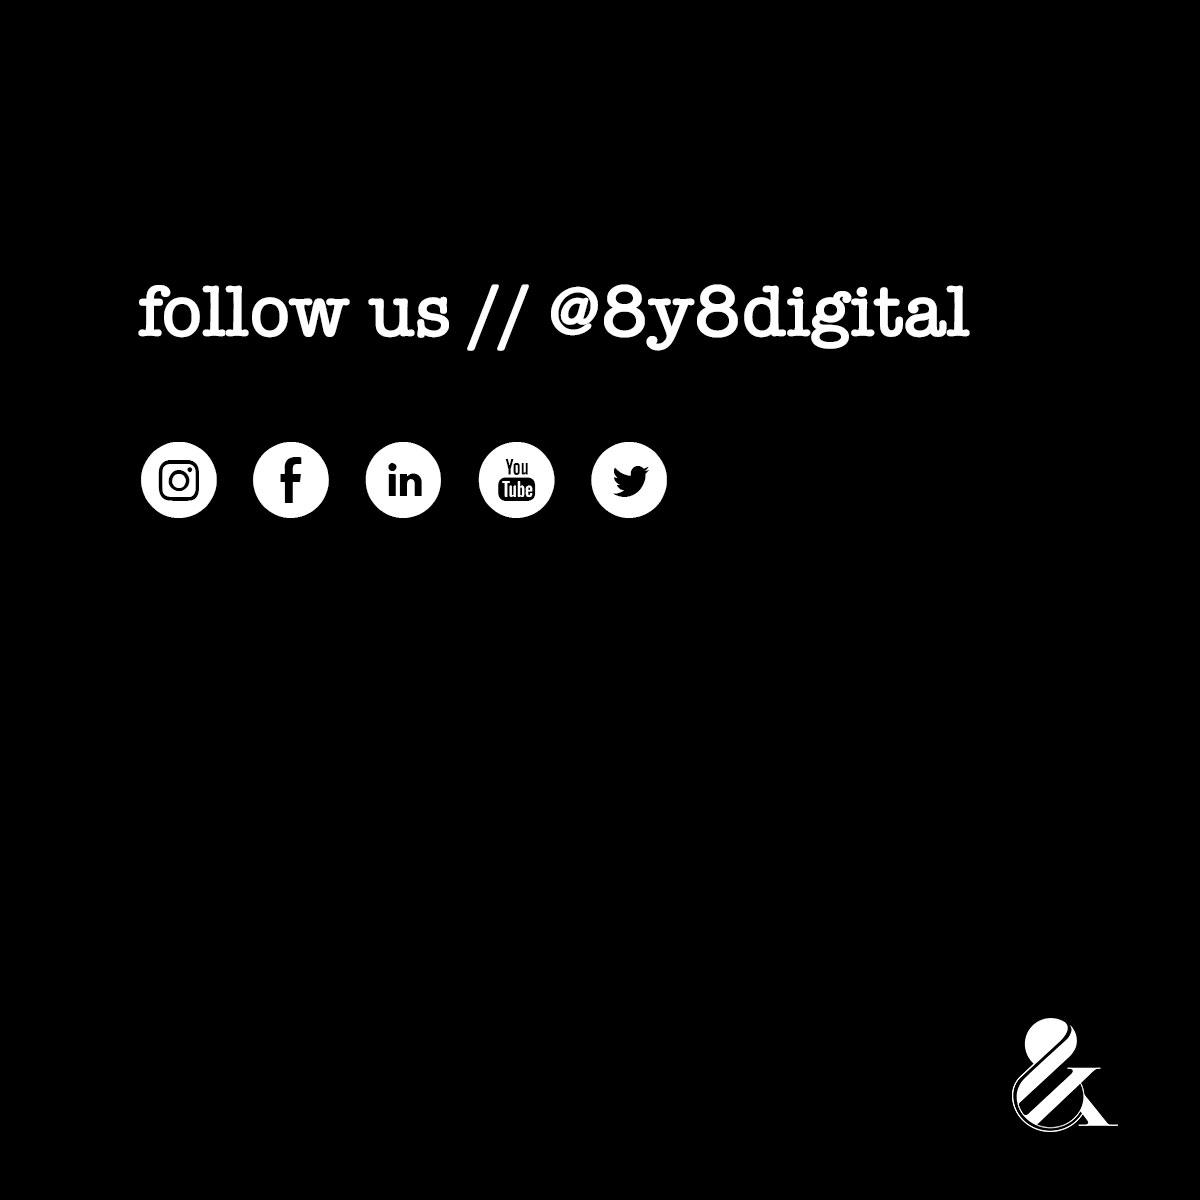 #FollowFriday  Síguenos en nuestras redes sociales!! #Gracias y a disfrutar tu finde!  #Follow #FollowUs #Friyay #Friday #Creative #Ideas #YourSelf #YourTime #BeYou #MarketingDigital #Advertising #Design #Create